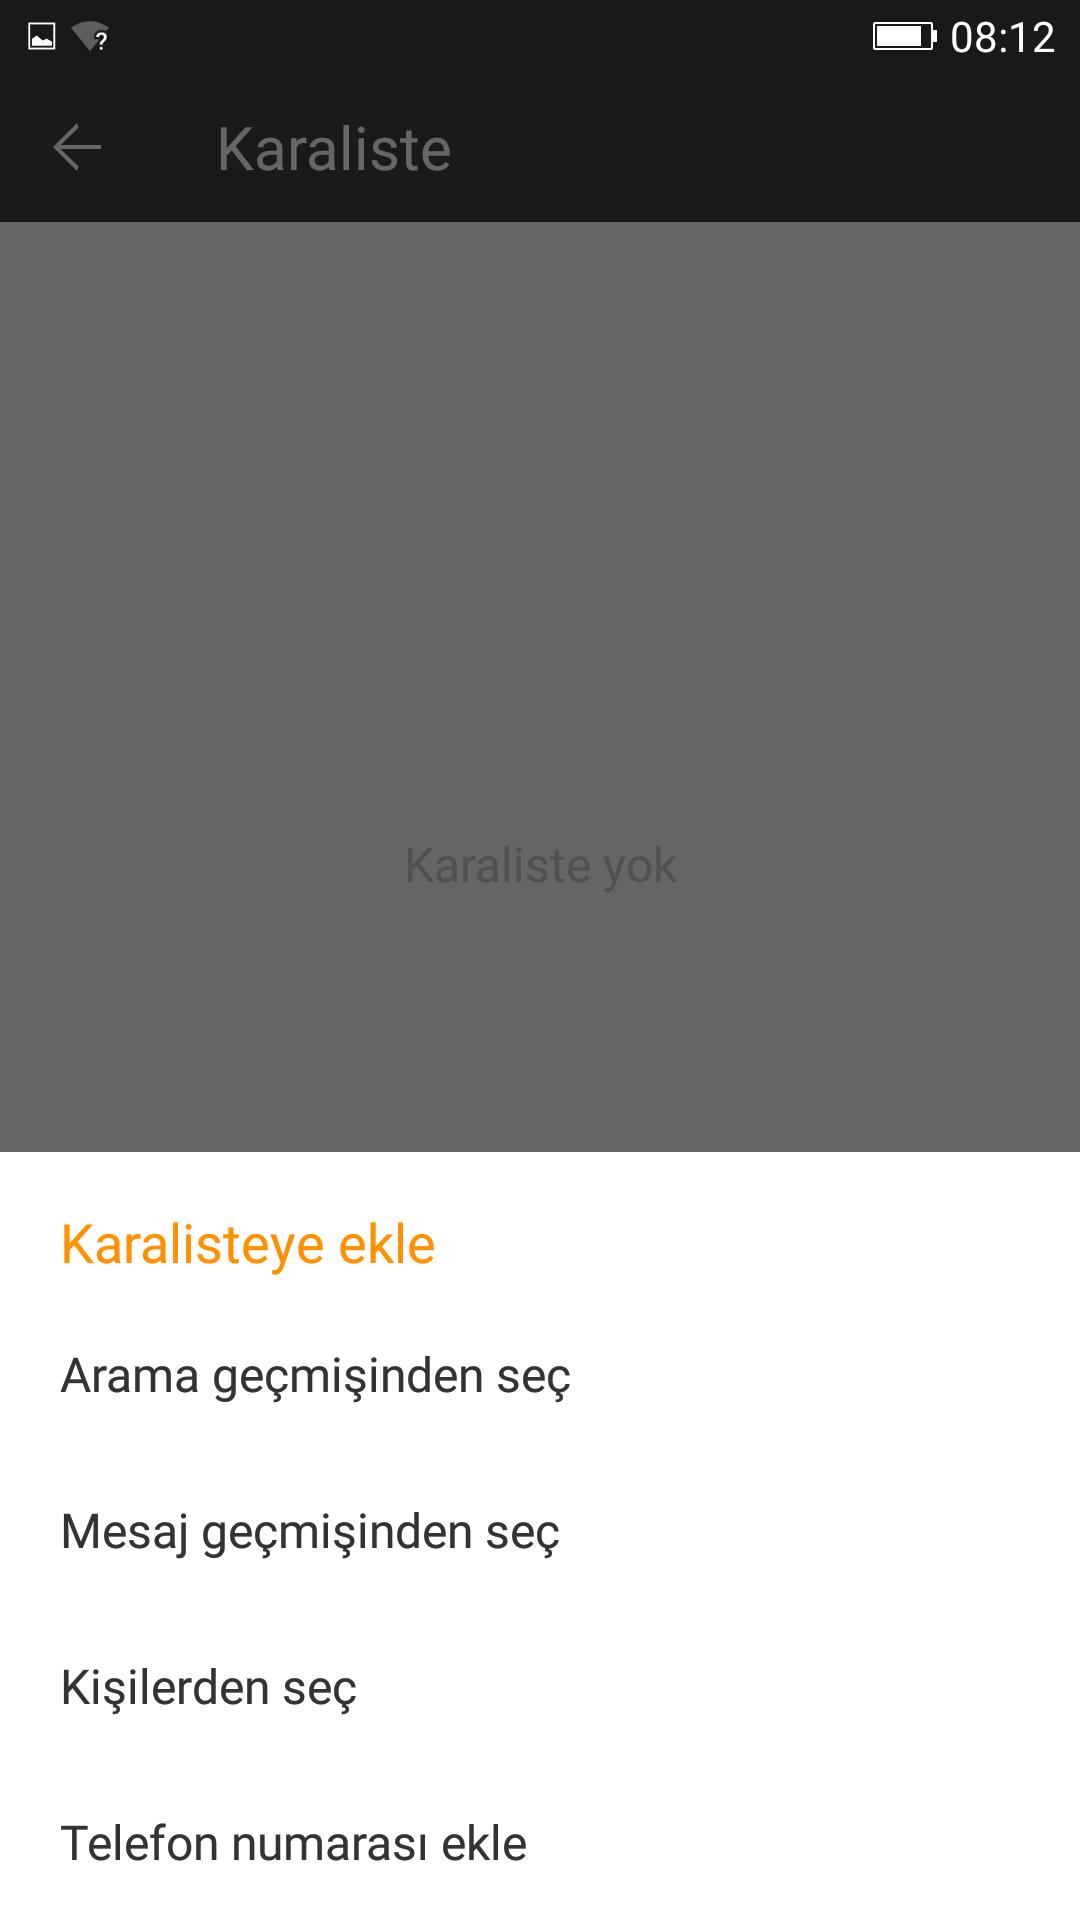 Screenshot_20160102-081257.png